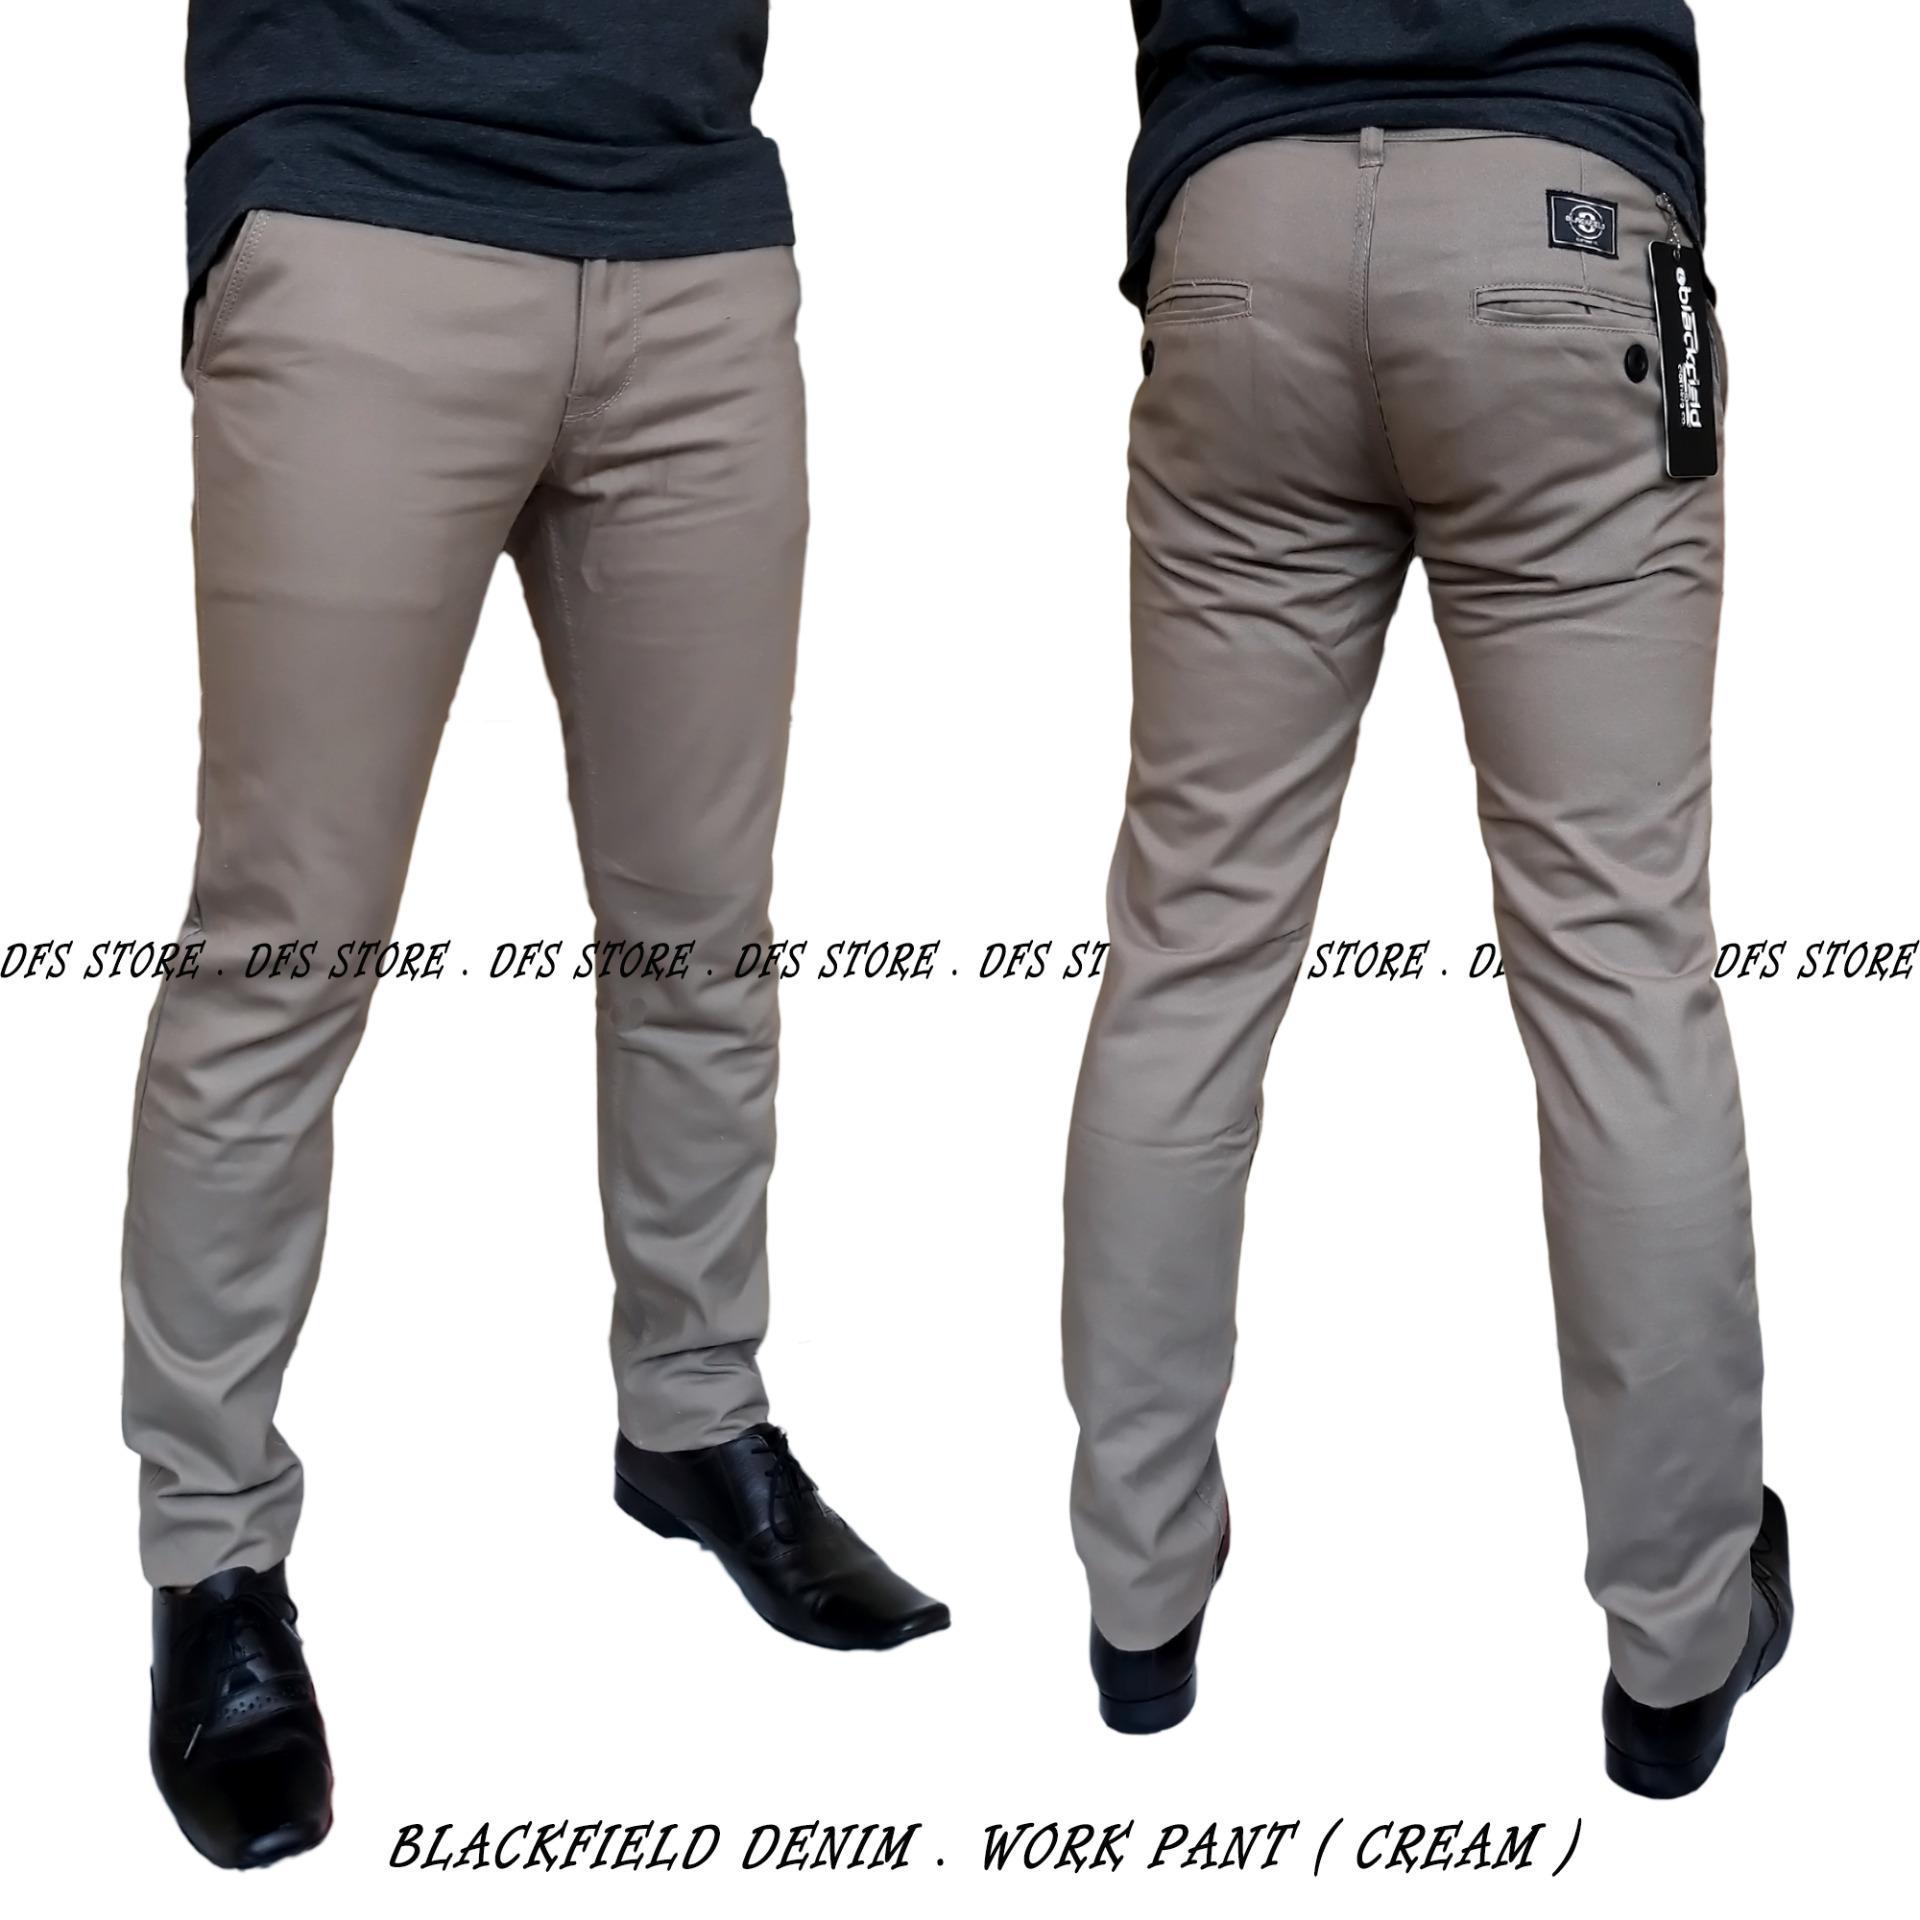 Cek Harga Baru R S T Celana Chino Pria Formal Premium Panjang Krem Polos Dfs Blackfield Kantor Cream